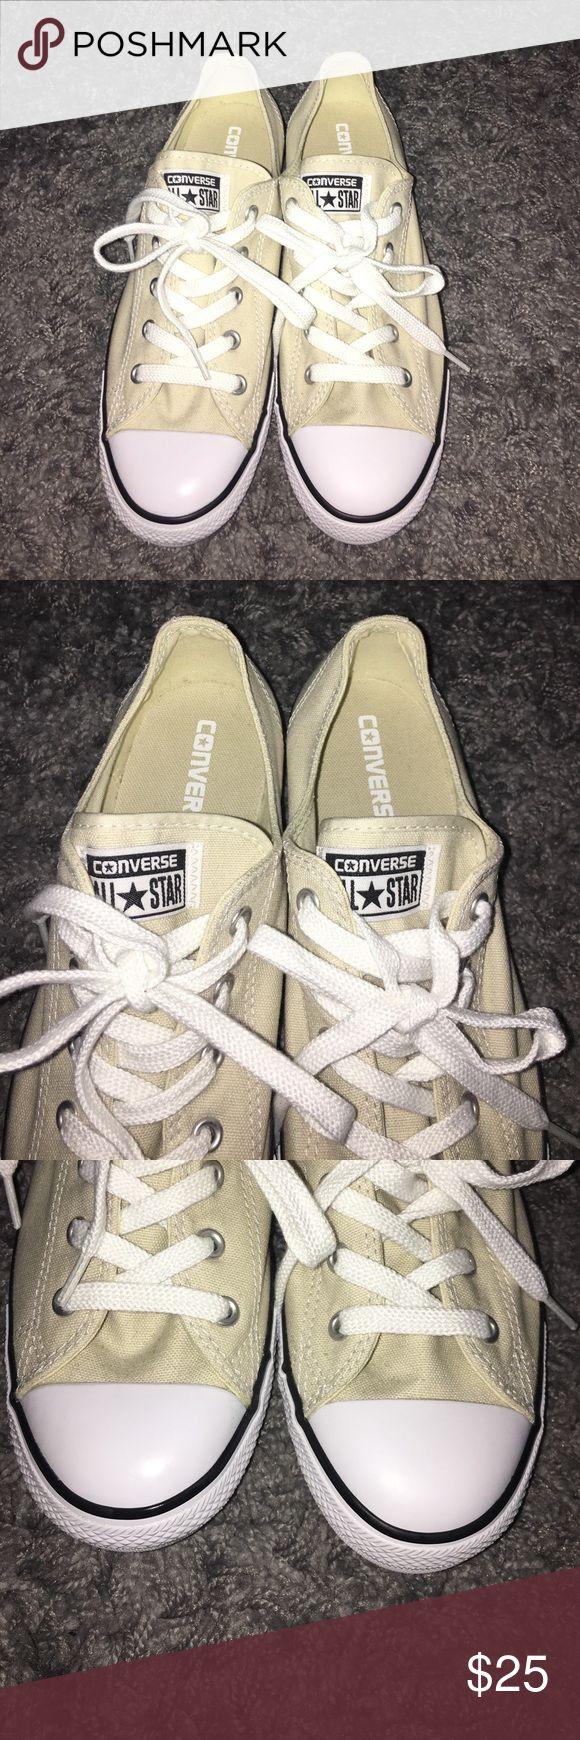 Brand new cream converse!! Brand new never worn cream converse! Size 9 Converse Shoes Sneakers